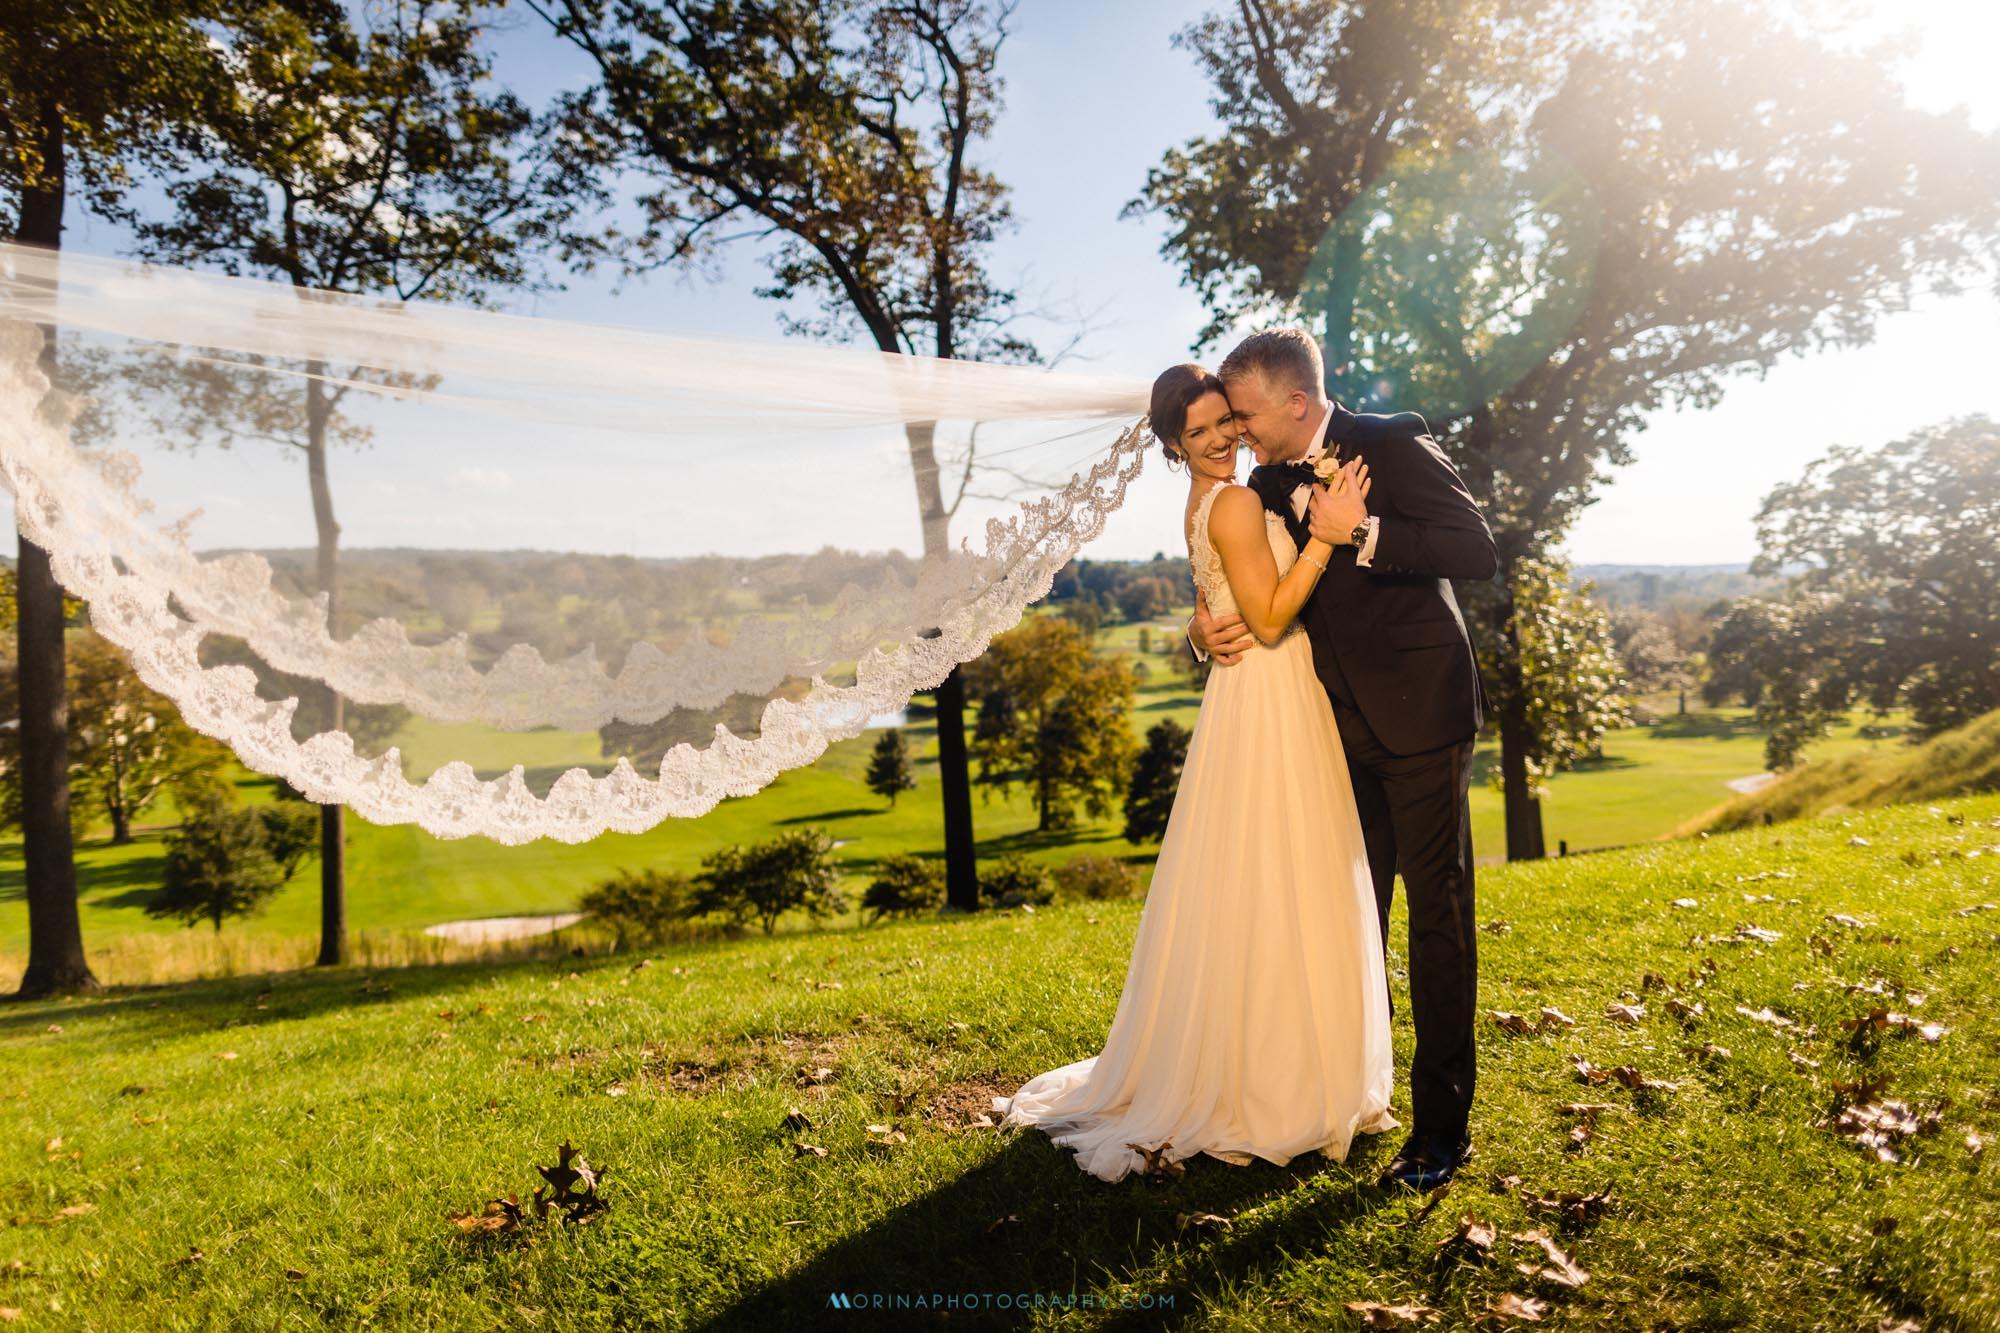 Colleen & Bill Wedding at Manufacturers' Golf & Country Club wedding 0050.jpg